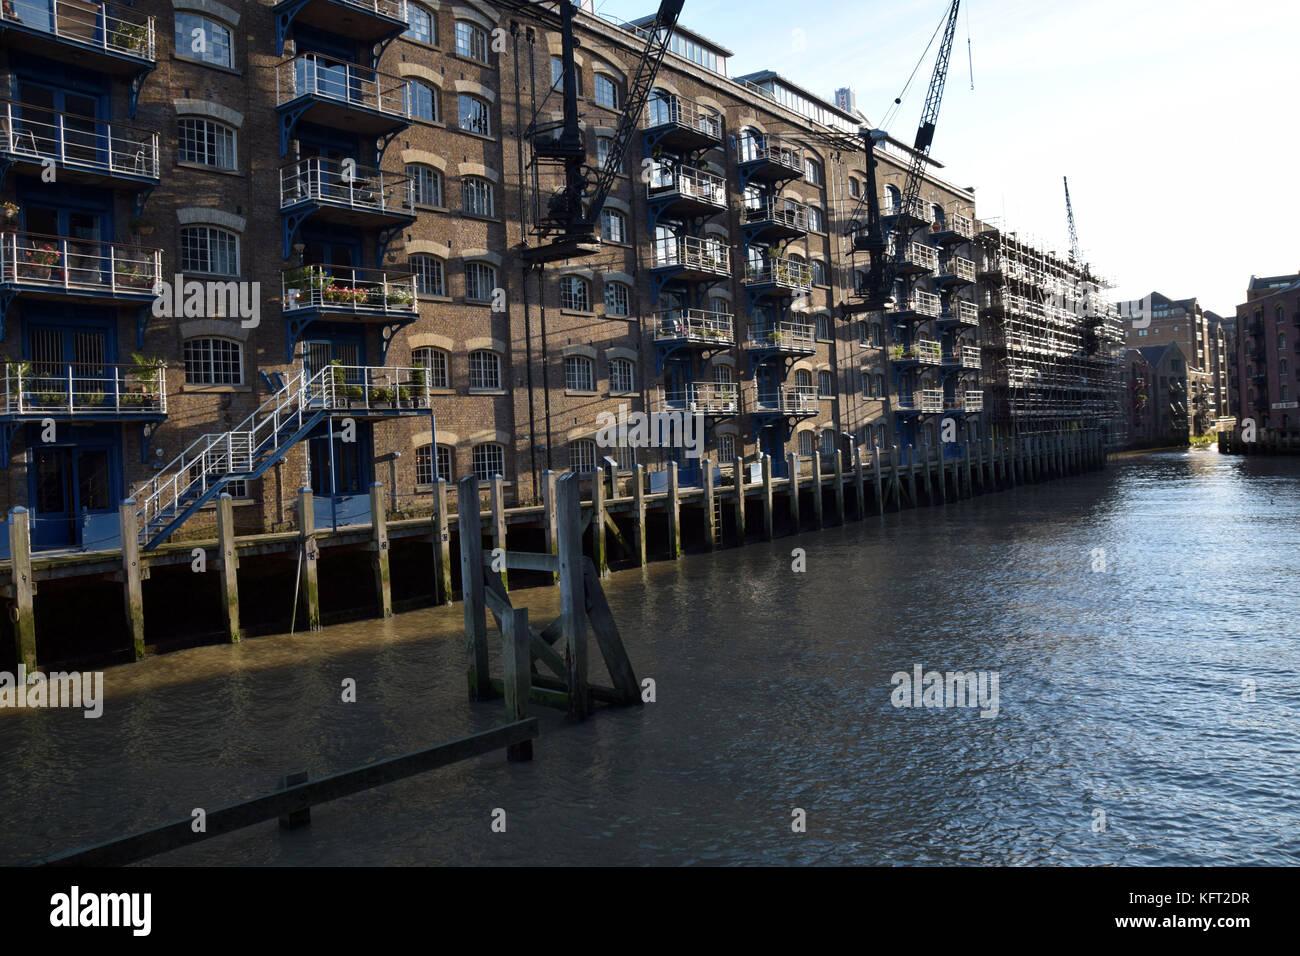 A Waterside Hotel Near Canary Wharf